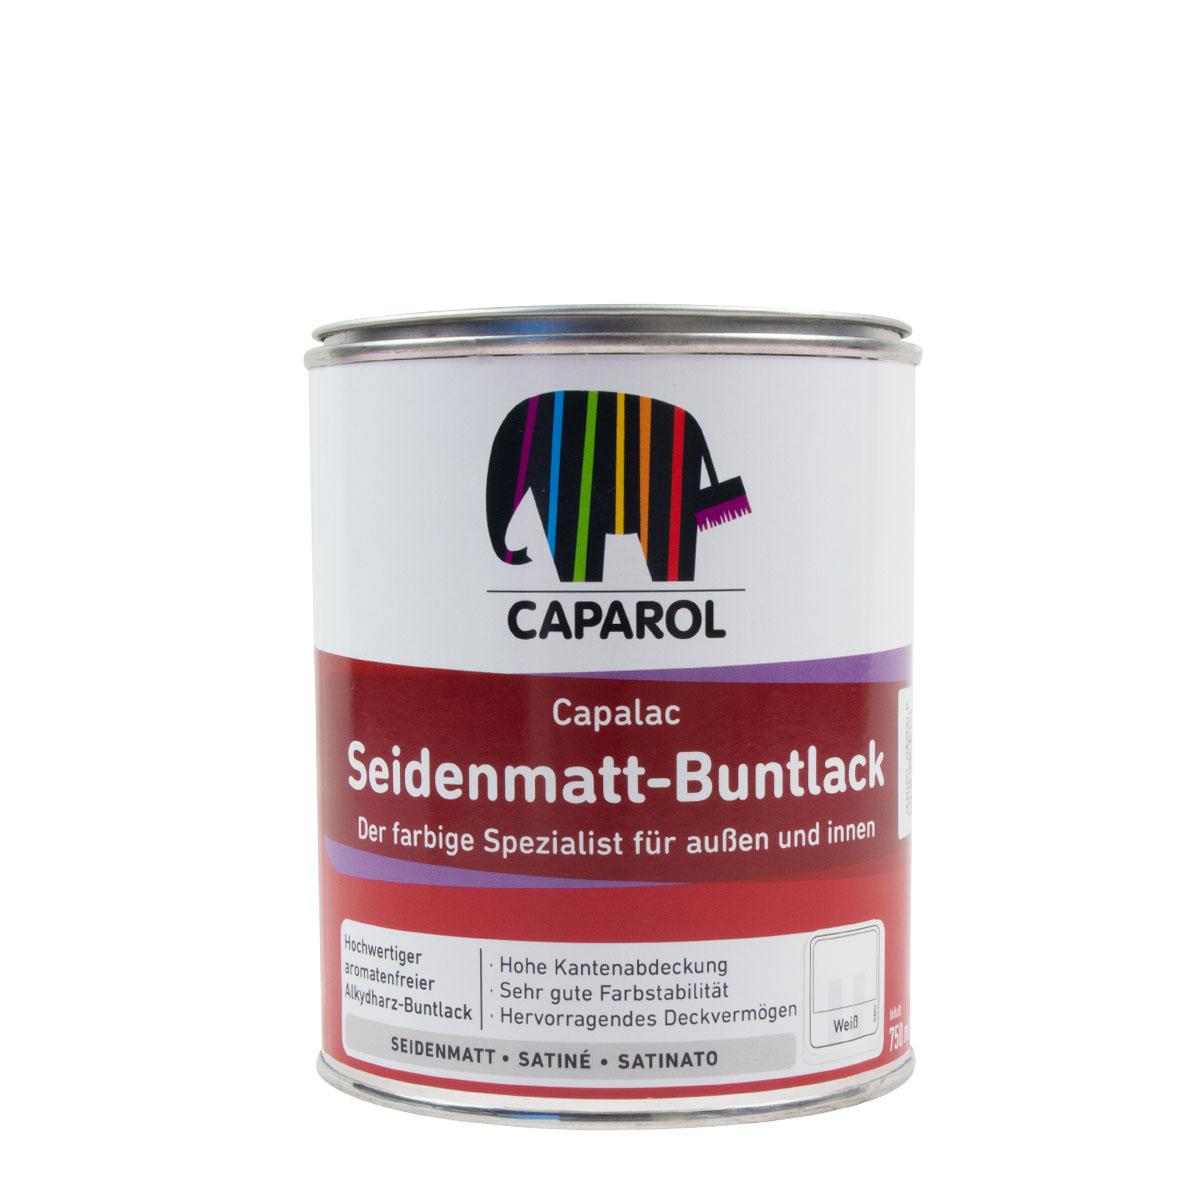 Caparol Capalac Seidenmatt-Buntlack 0,75L weiss, Alkydharz-Buntlack